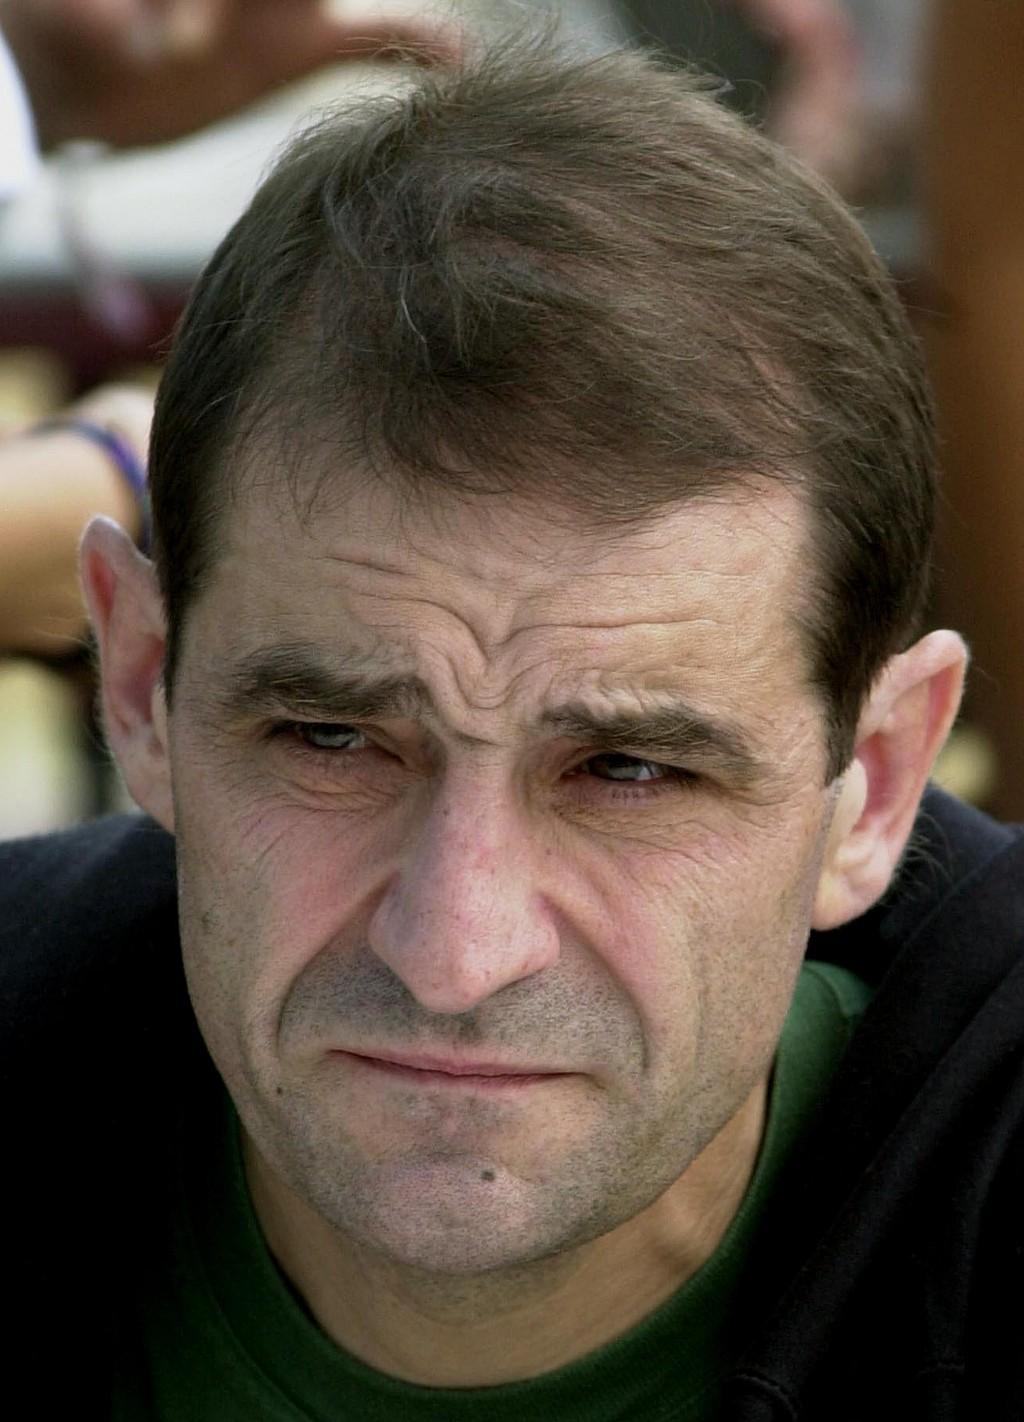 FILE - In this Sept.3, 2000 file photo, Jose Antonio Urruticoetxea Bengoetxea, known by the alias Josu Ternera, a leader of the Basque separatist grou